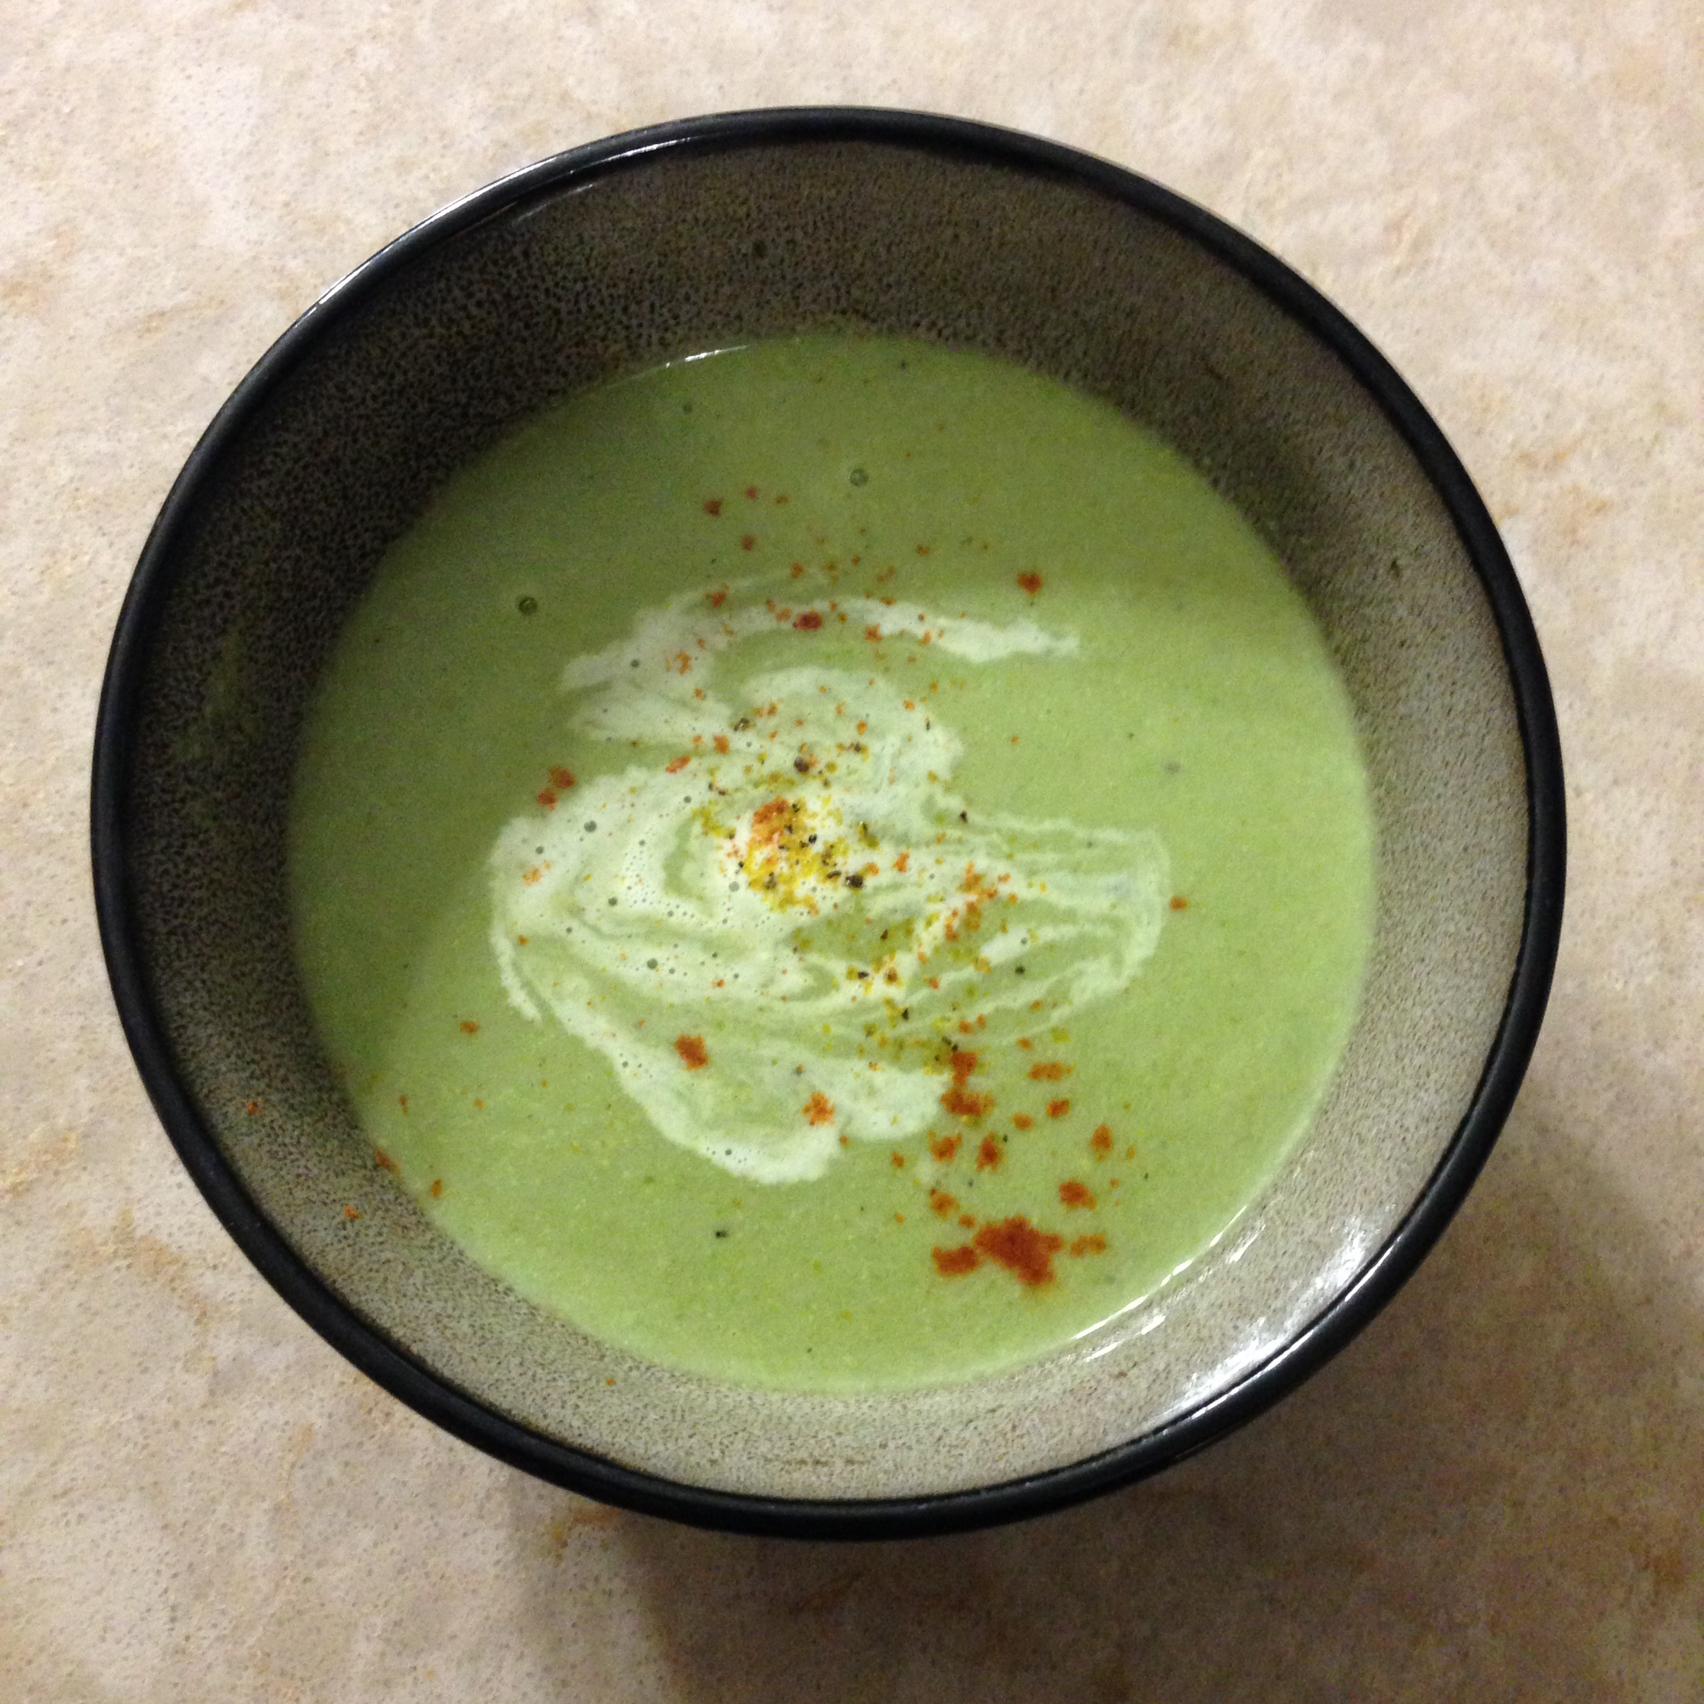 Chef John's Cream of Asparagus Soup image